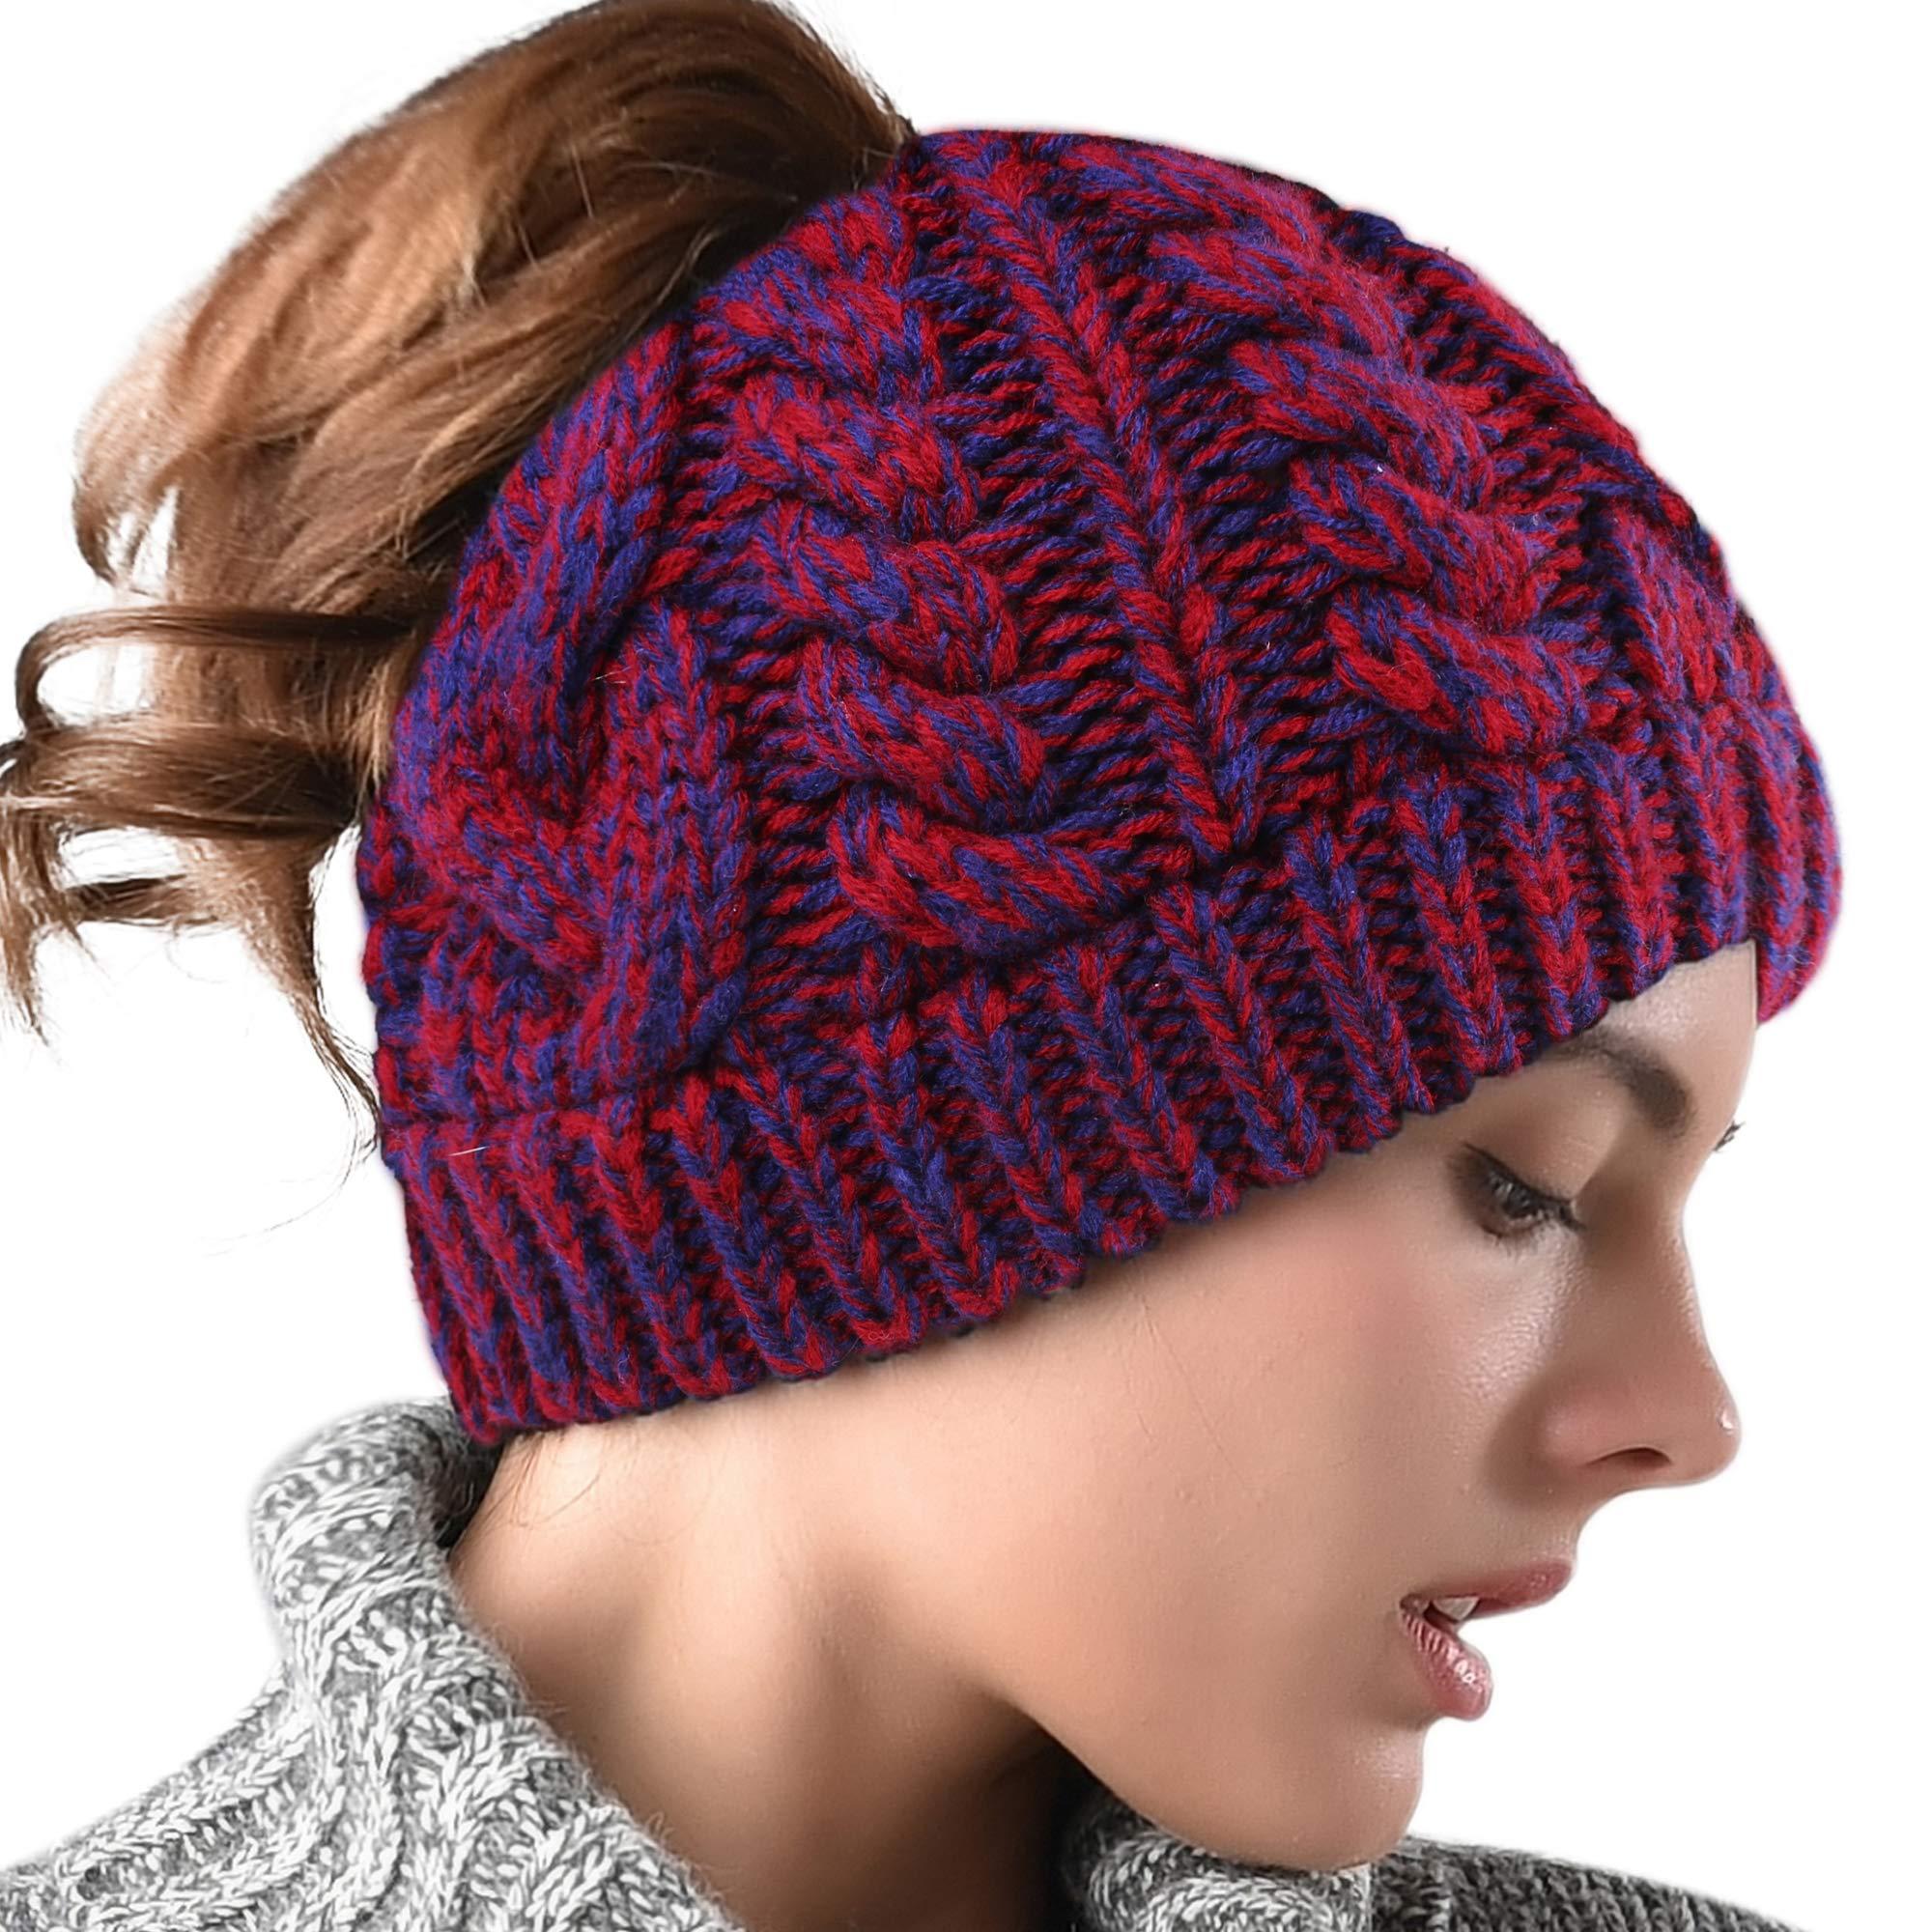 693a9644cb36b Women Hat Knit Skull Beanie Winter Outdoor Runner Messy Bun Ponytail Cap  product image